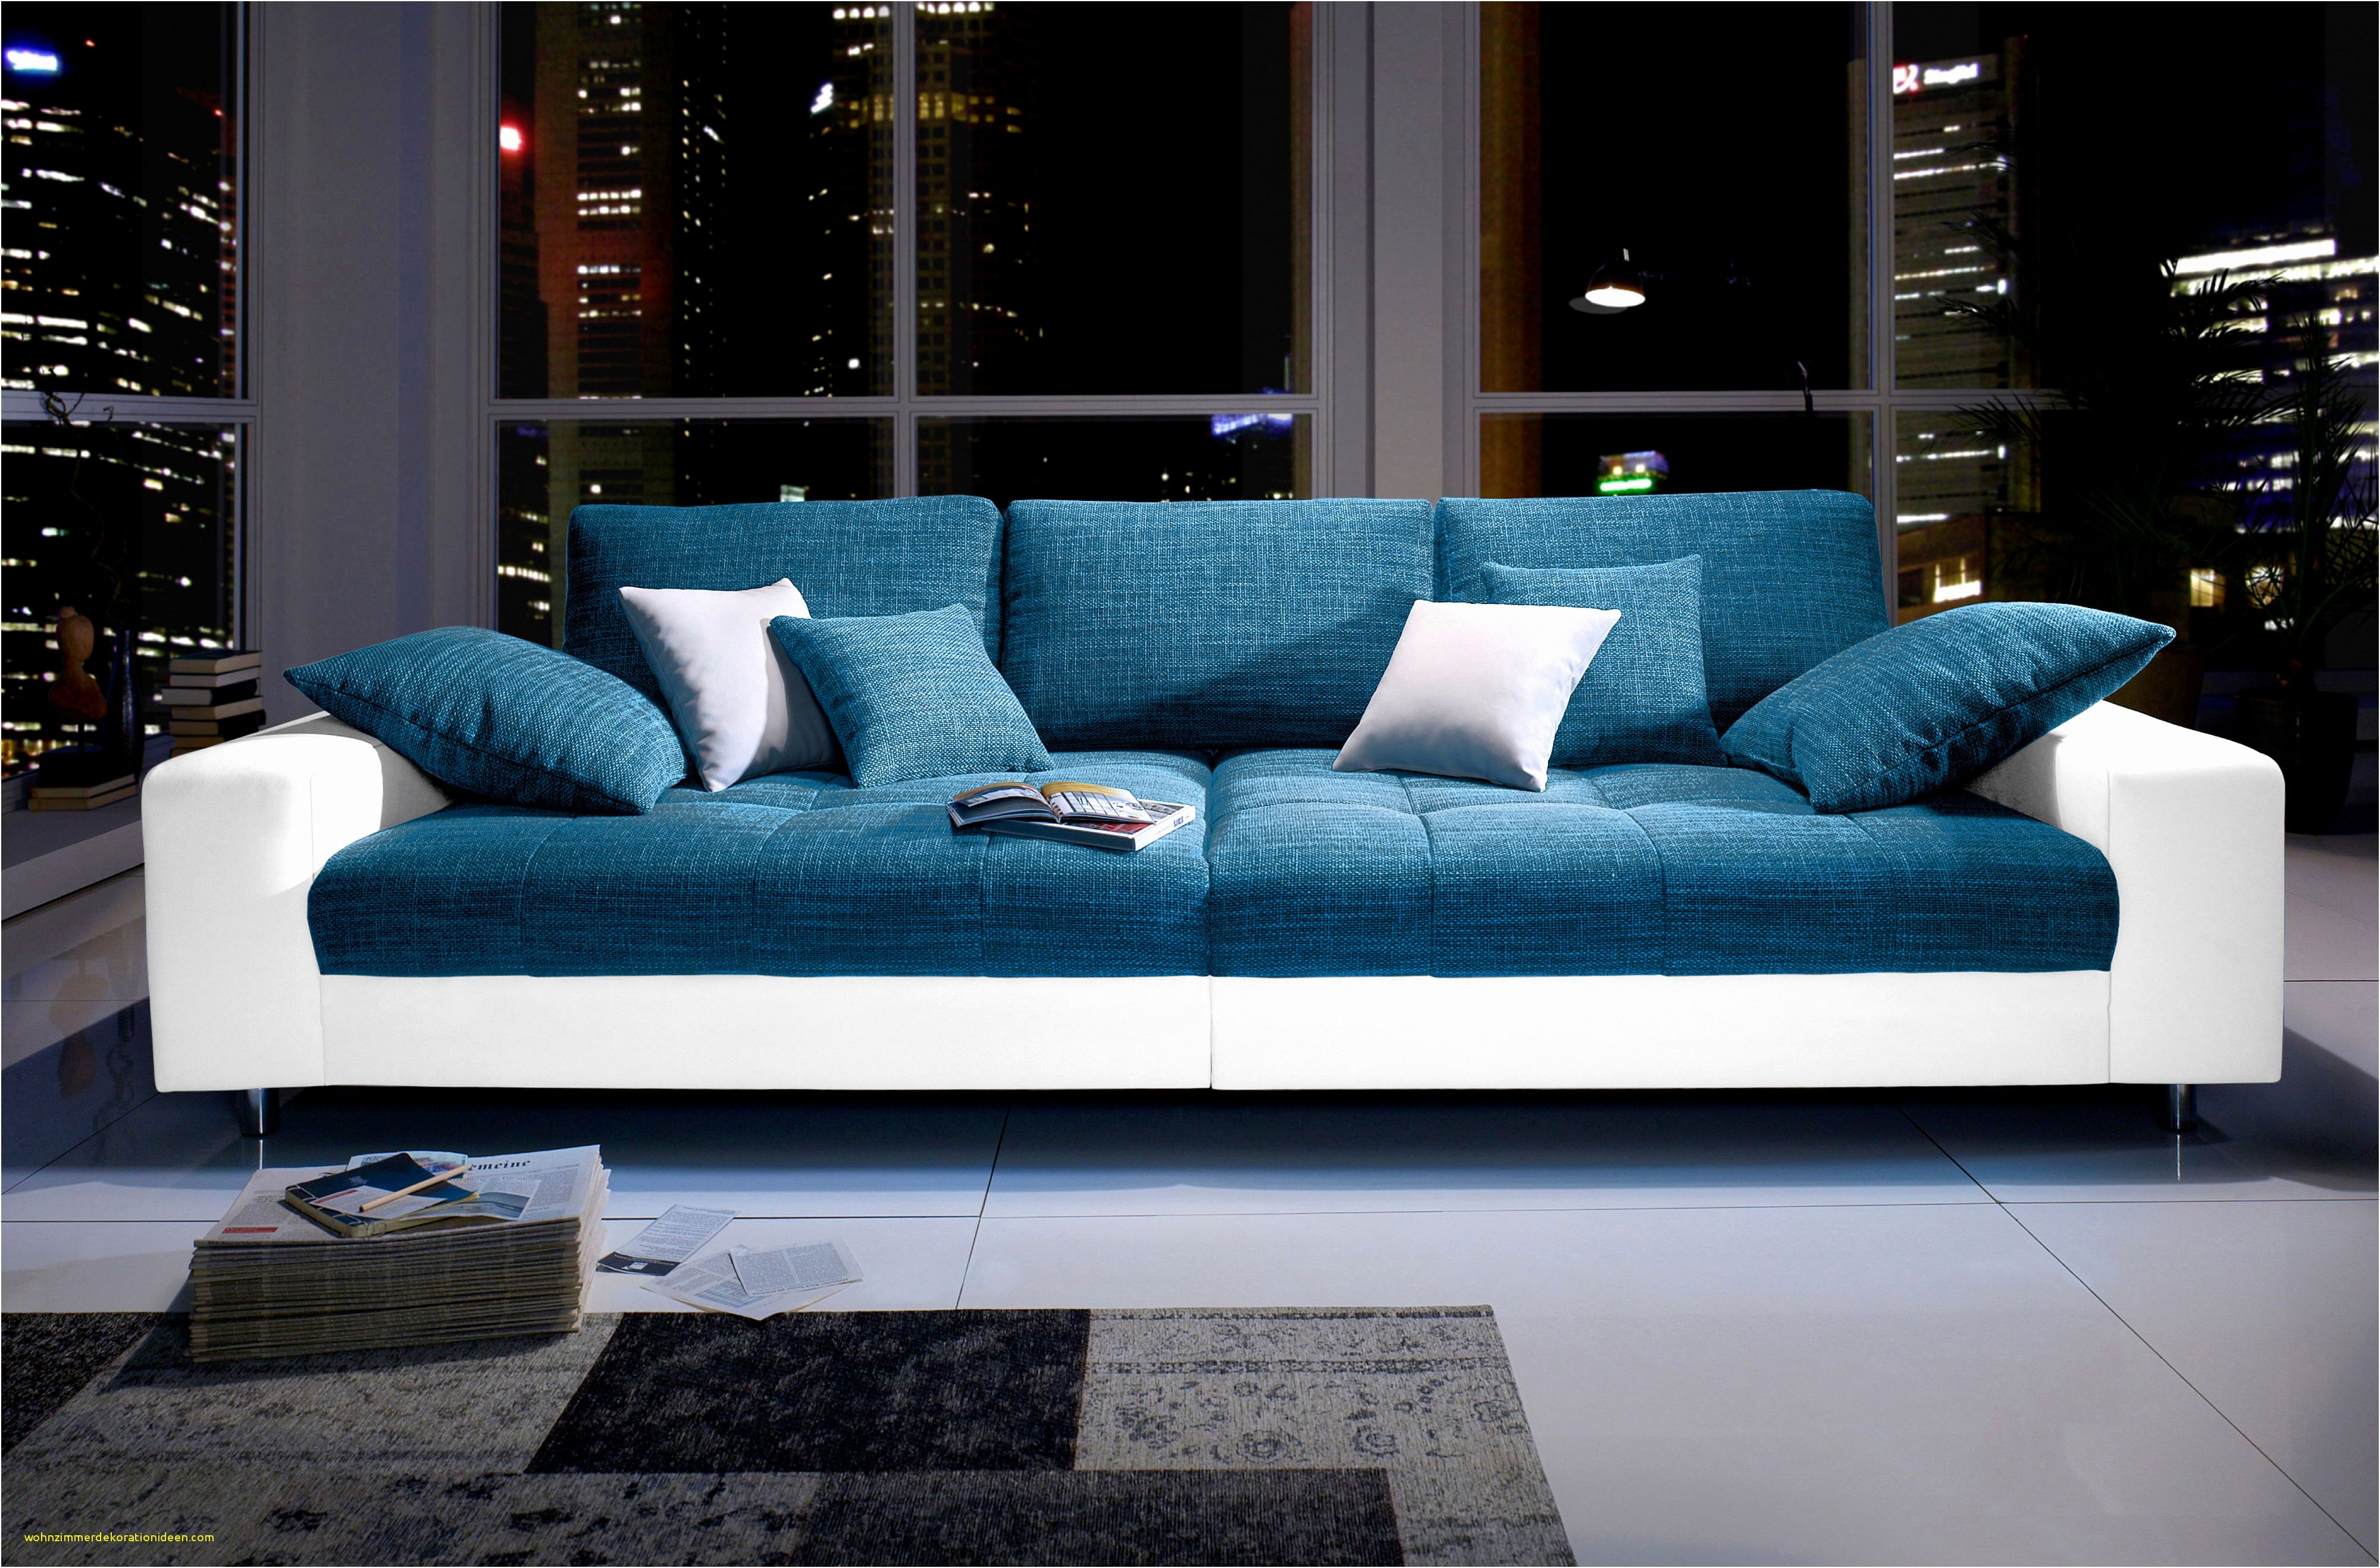 Top Ergebnis Boxspring Big Sofa Einzigartig Ecksofa Mit Led Beleuchtung Top Designer Sofa Carezza Xxl Mit Dengan Gambar